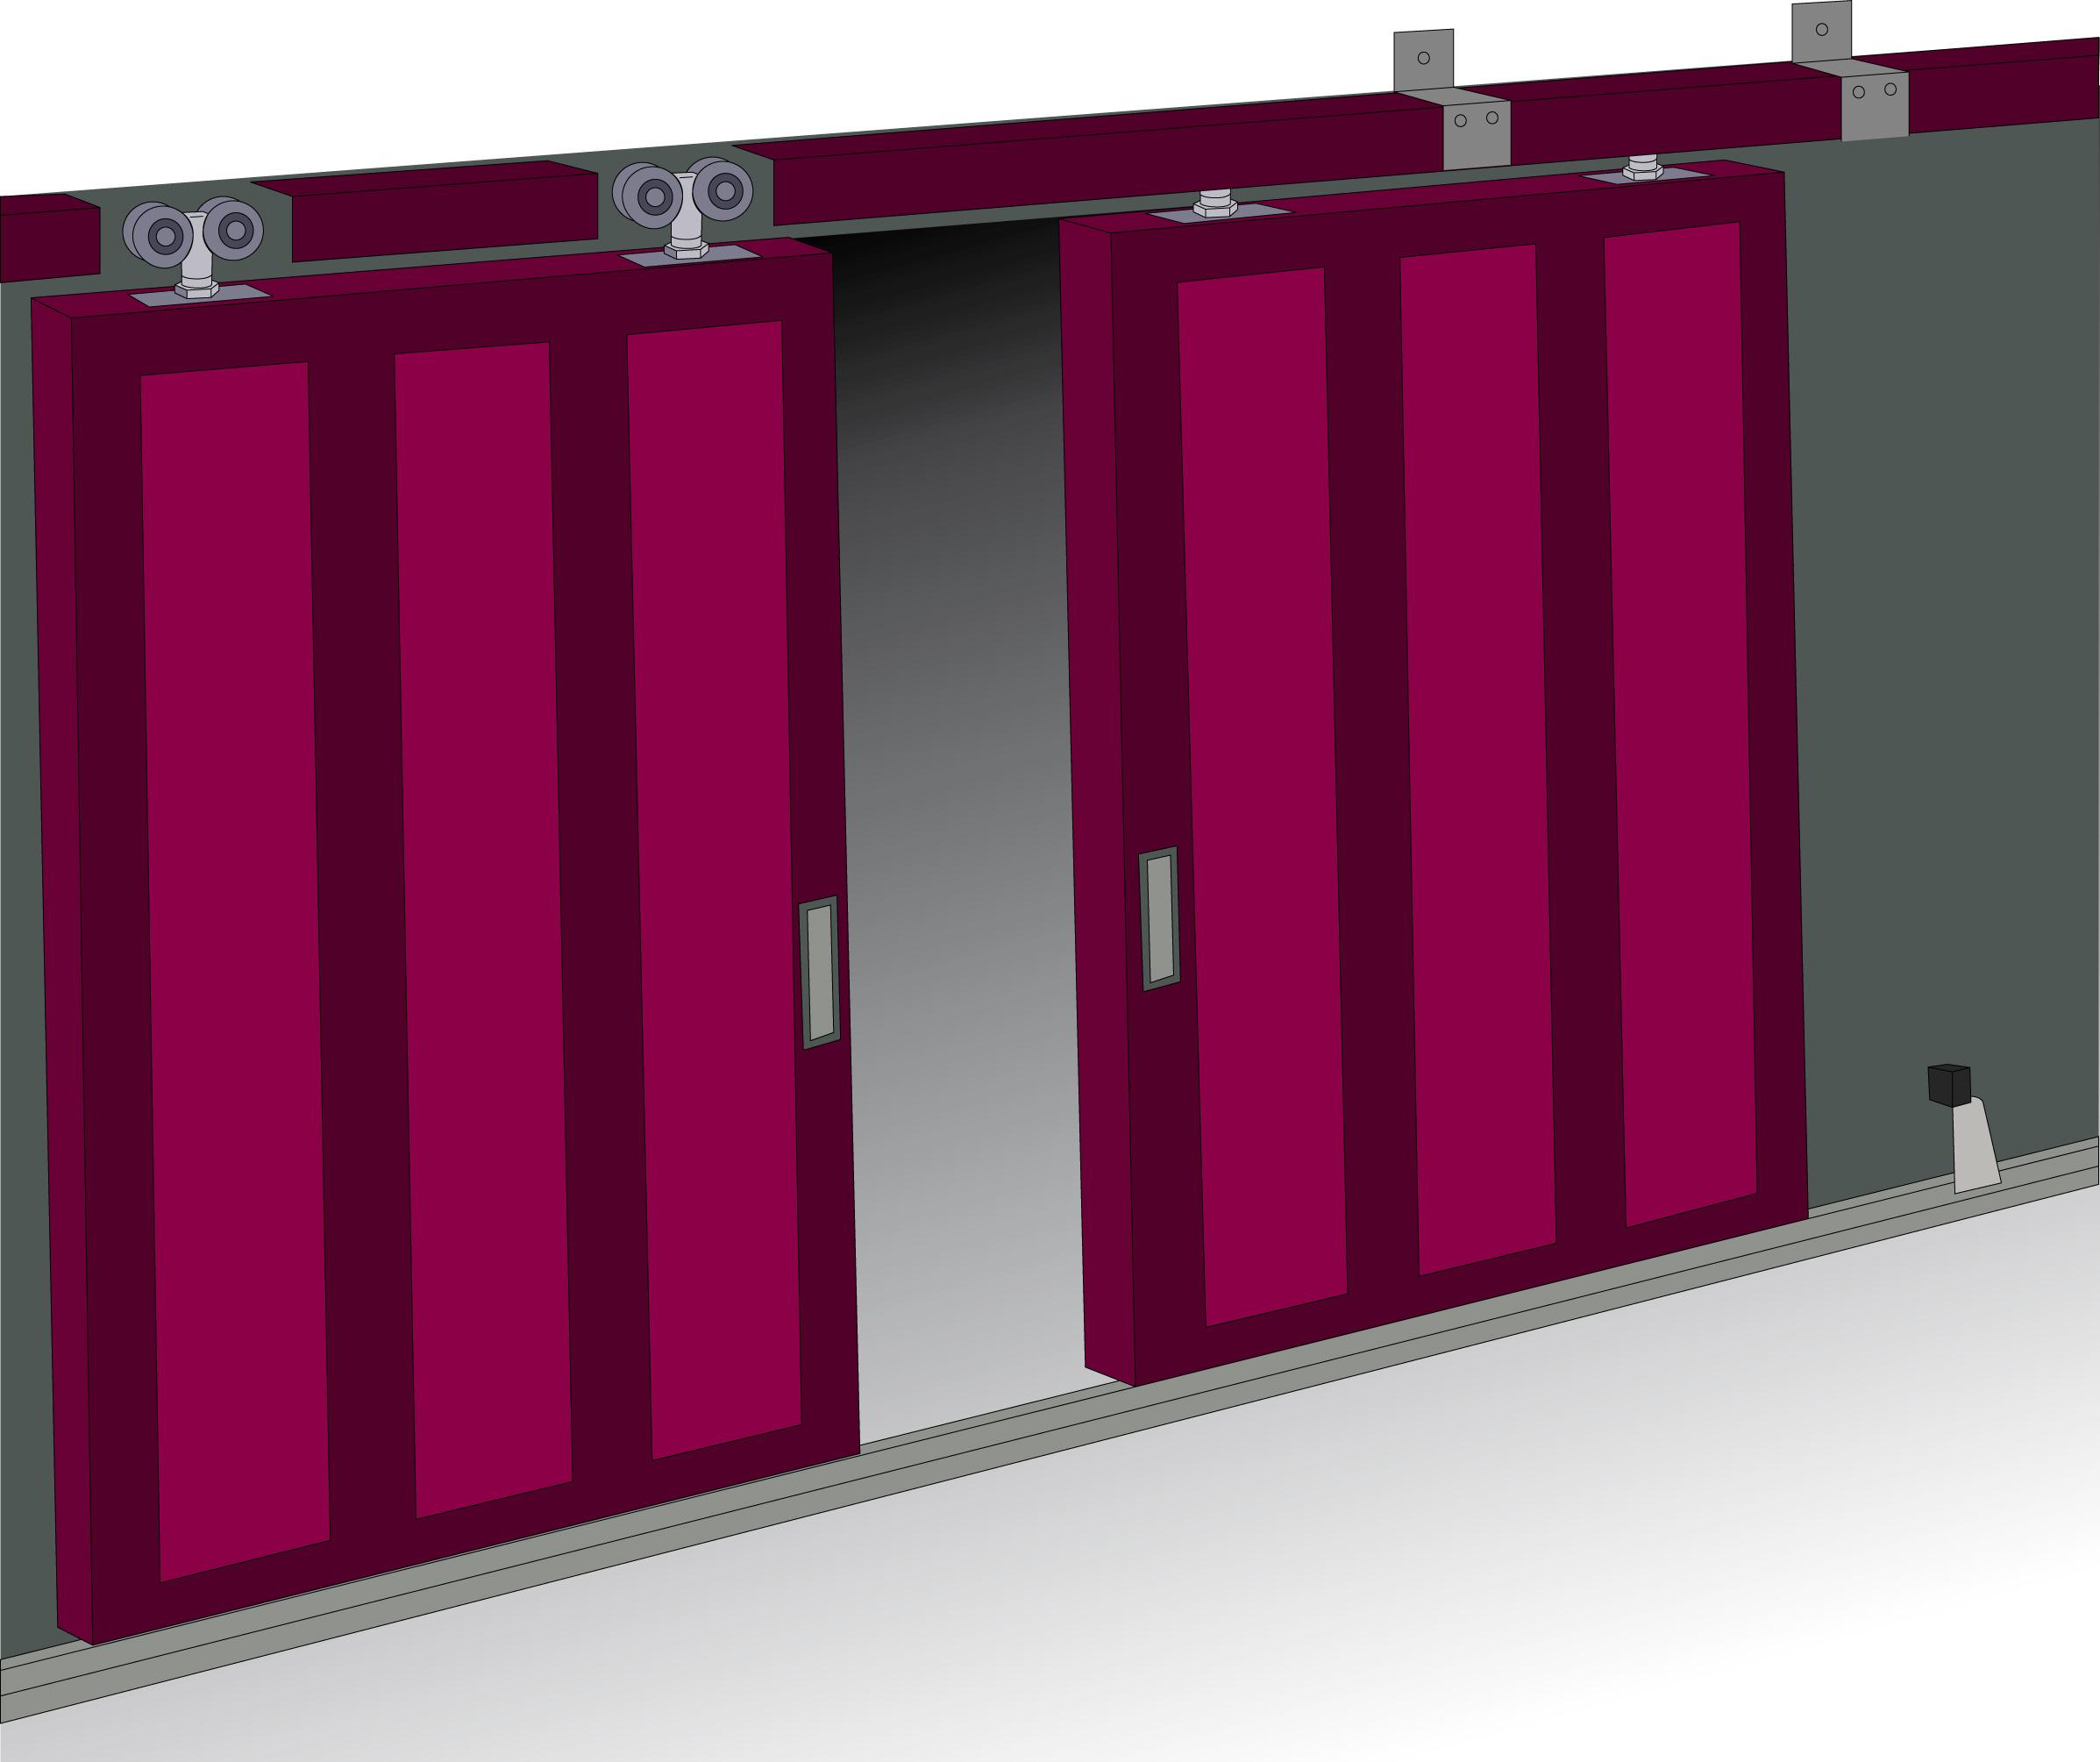 Herrajes para puertas metalicas herrajes puertas for Herrajes para puertas